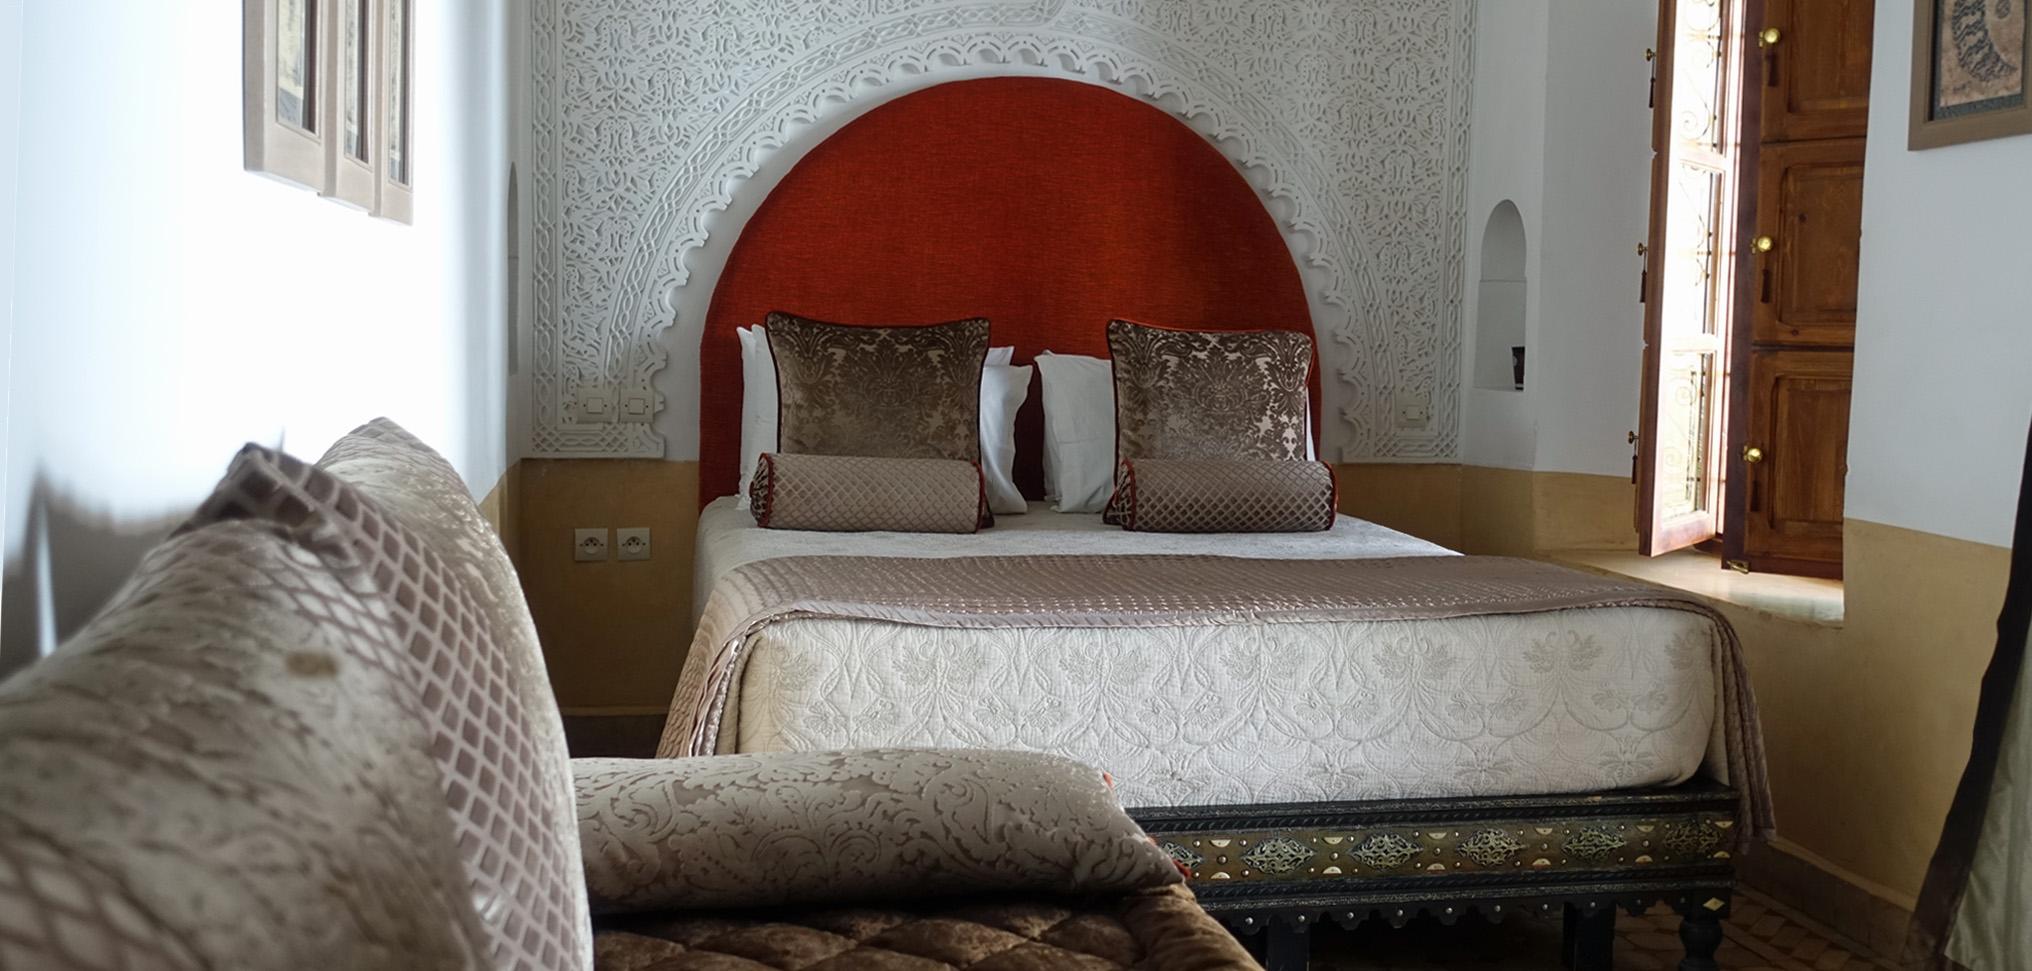 Jauzi 1. Bedroom